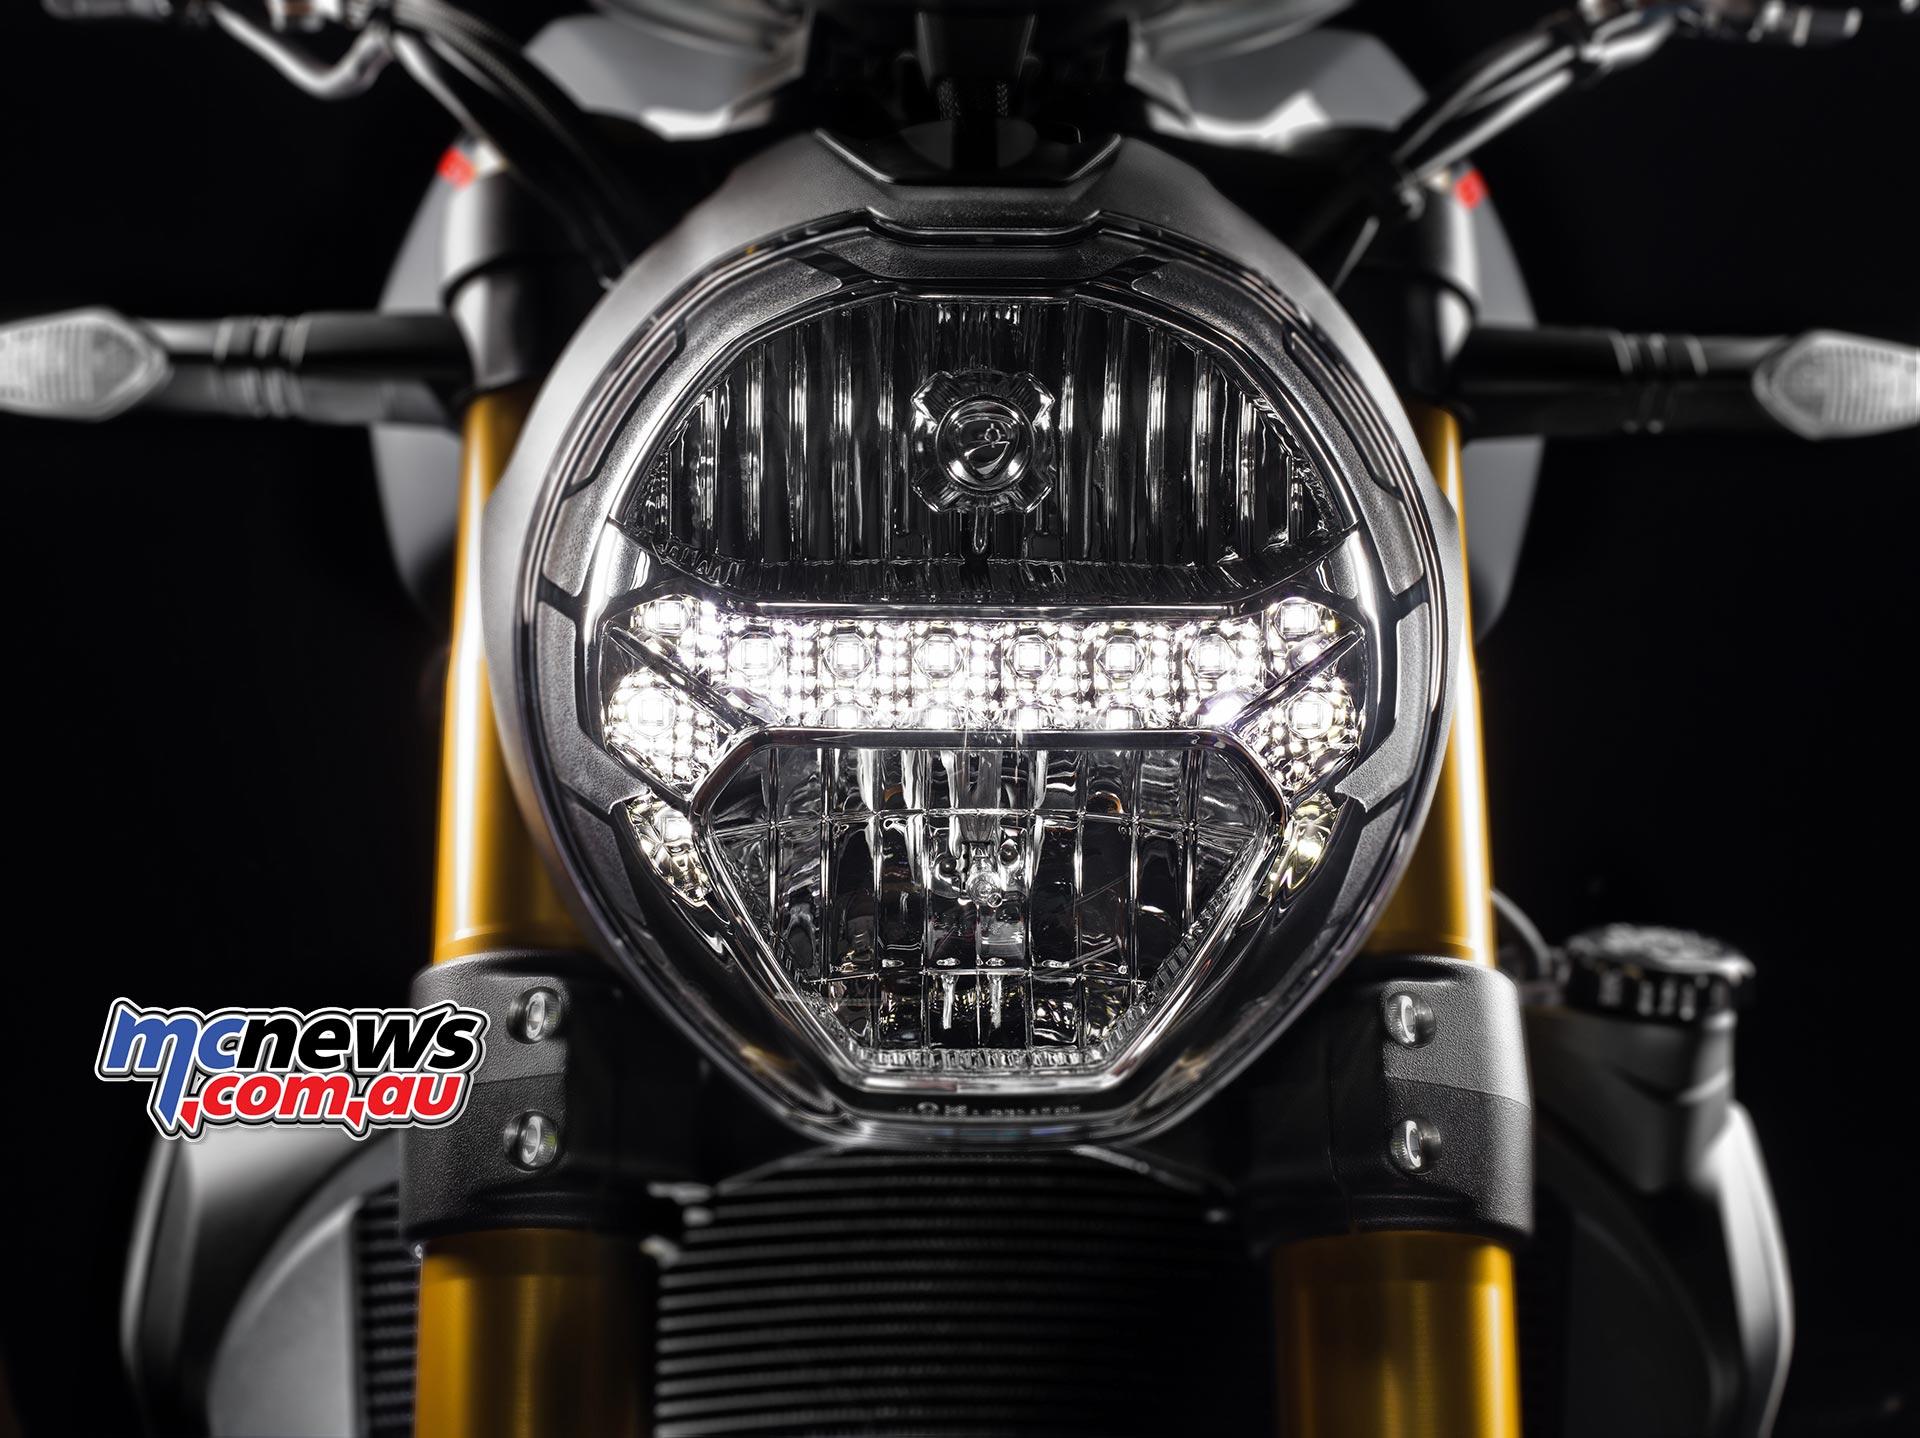 2017 Ducati Monster 1200 S Updated Led Tail Light Wiring On Diagram Horseshoe Side Lights